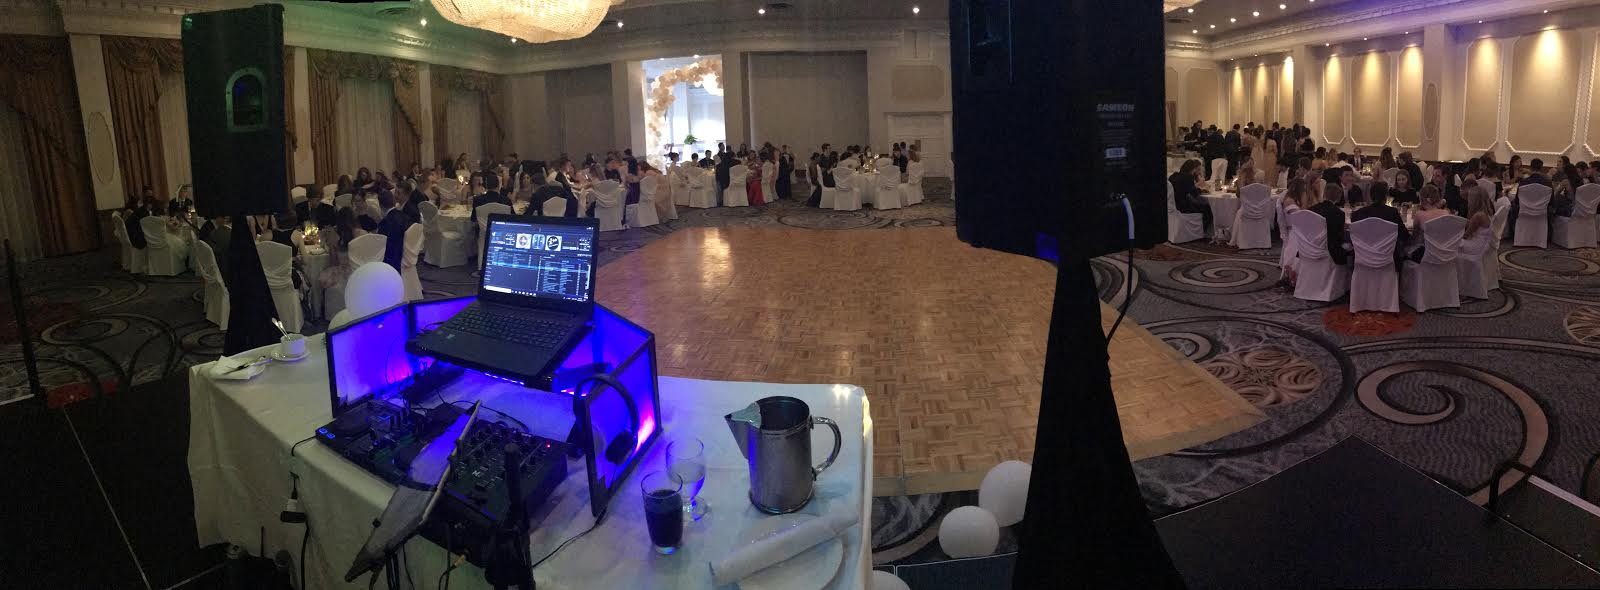 FEHS Prom 2018 - Crowne Plaza